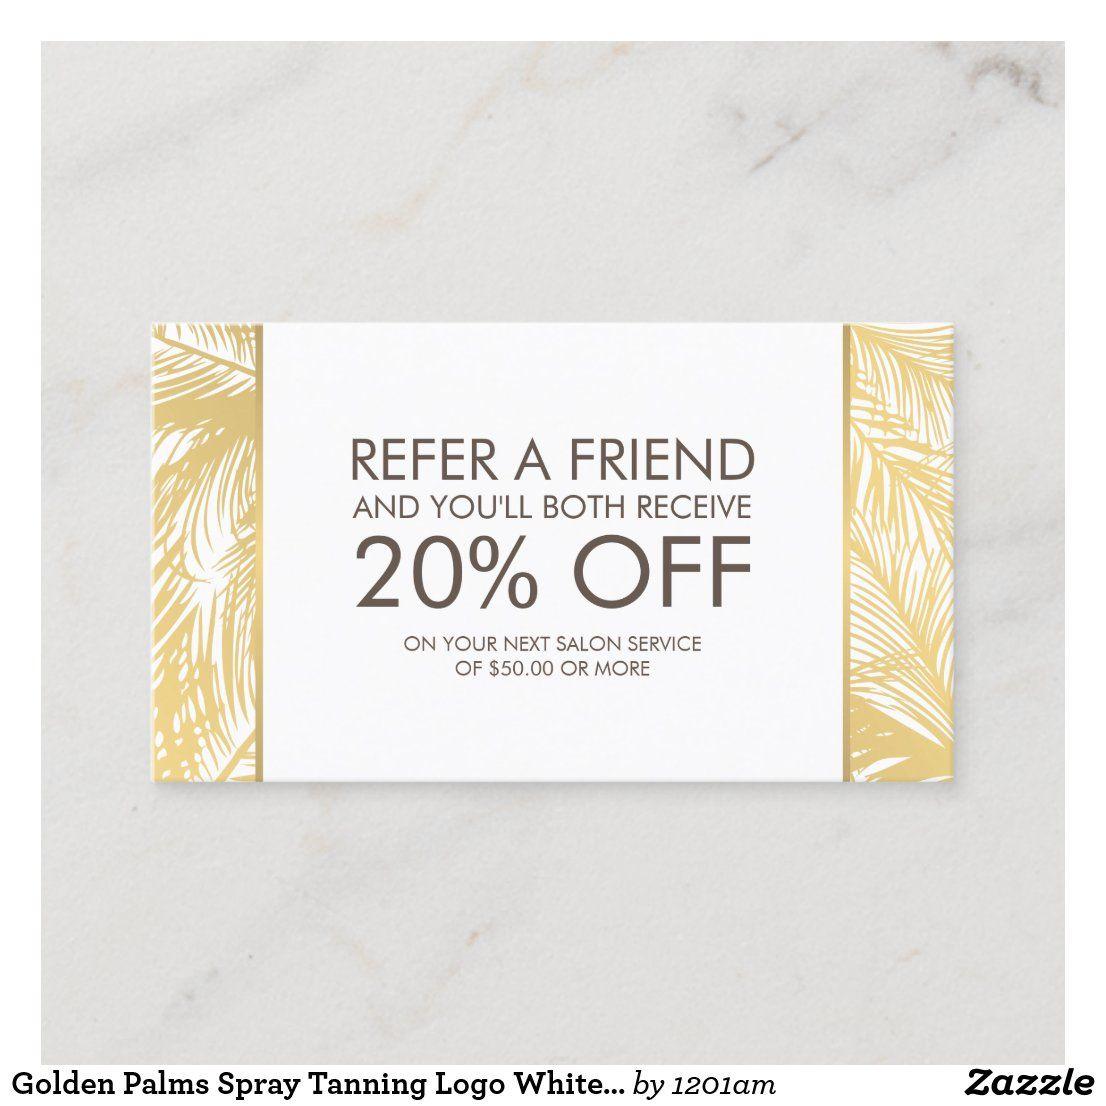 Golden Palms Spray Tanning Logo White Referral Zazzle Com Spray Tan Salons Spray Tanning White Business Card